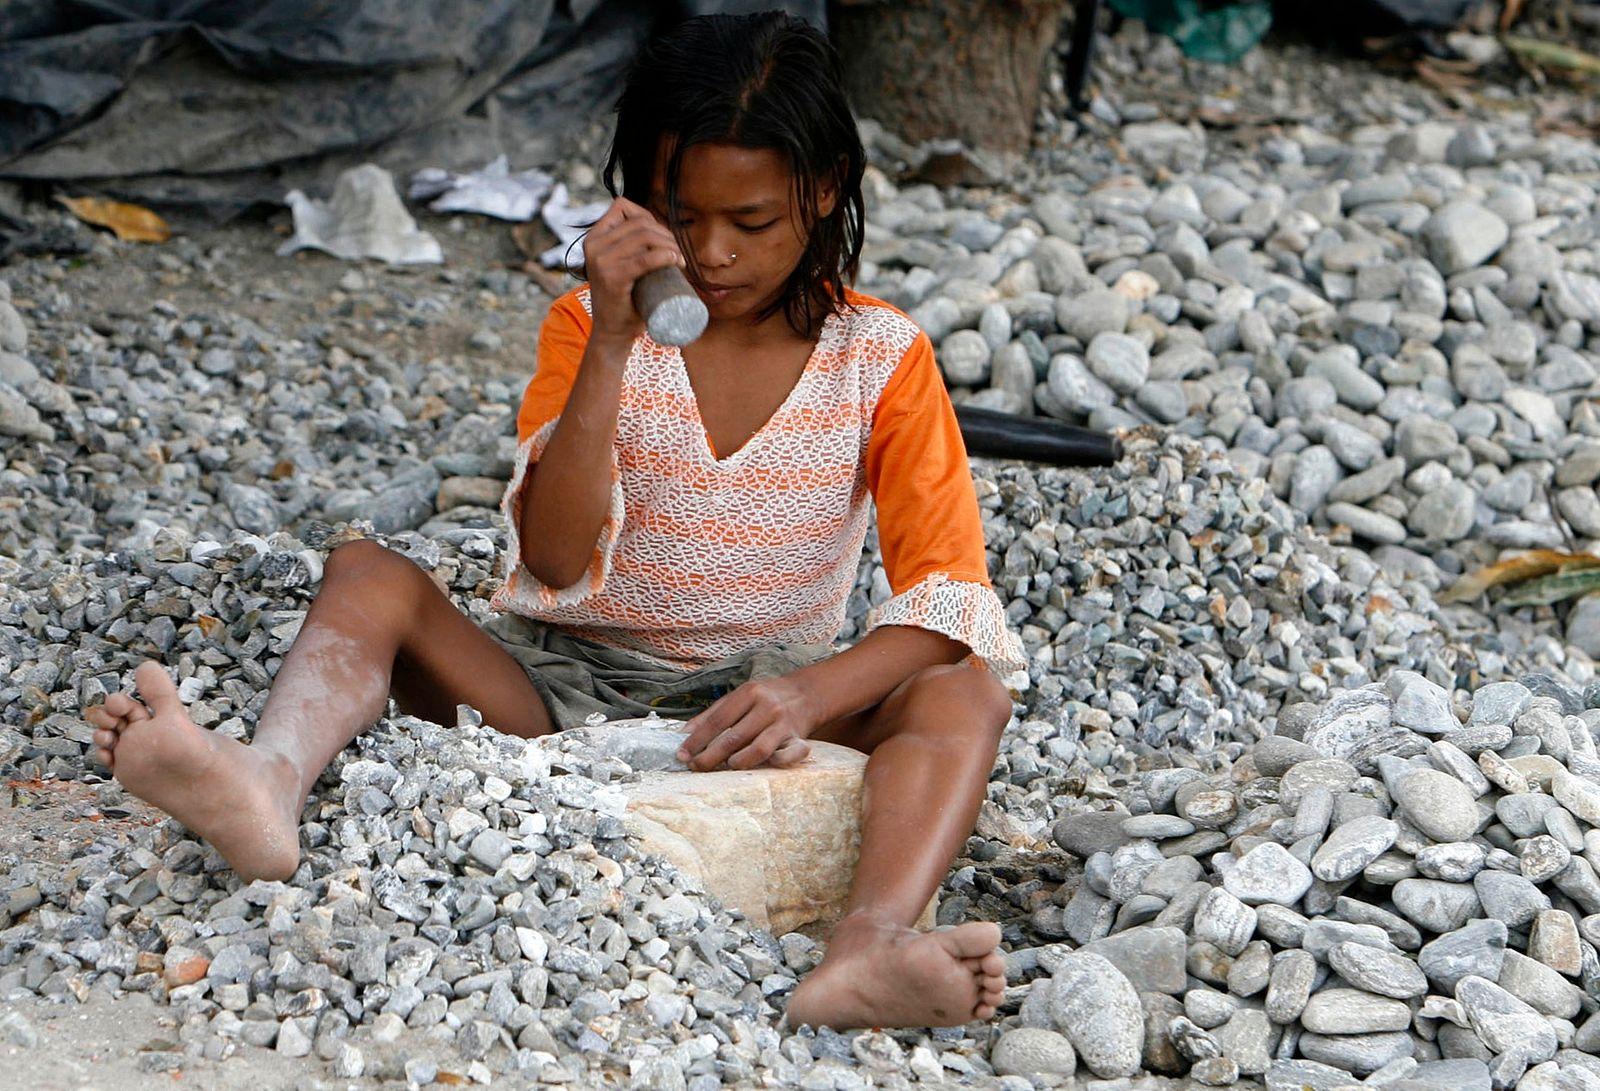 Nine-year old Ganga Burman, a child labourer, breaks stones in Siliguri